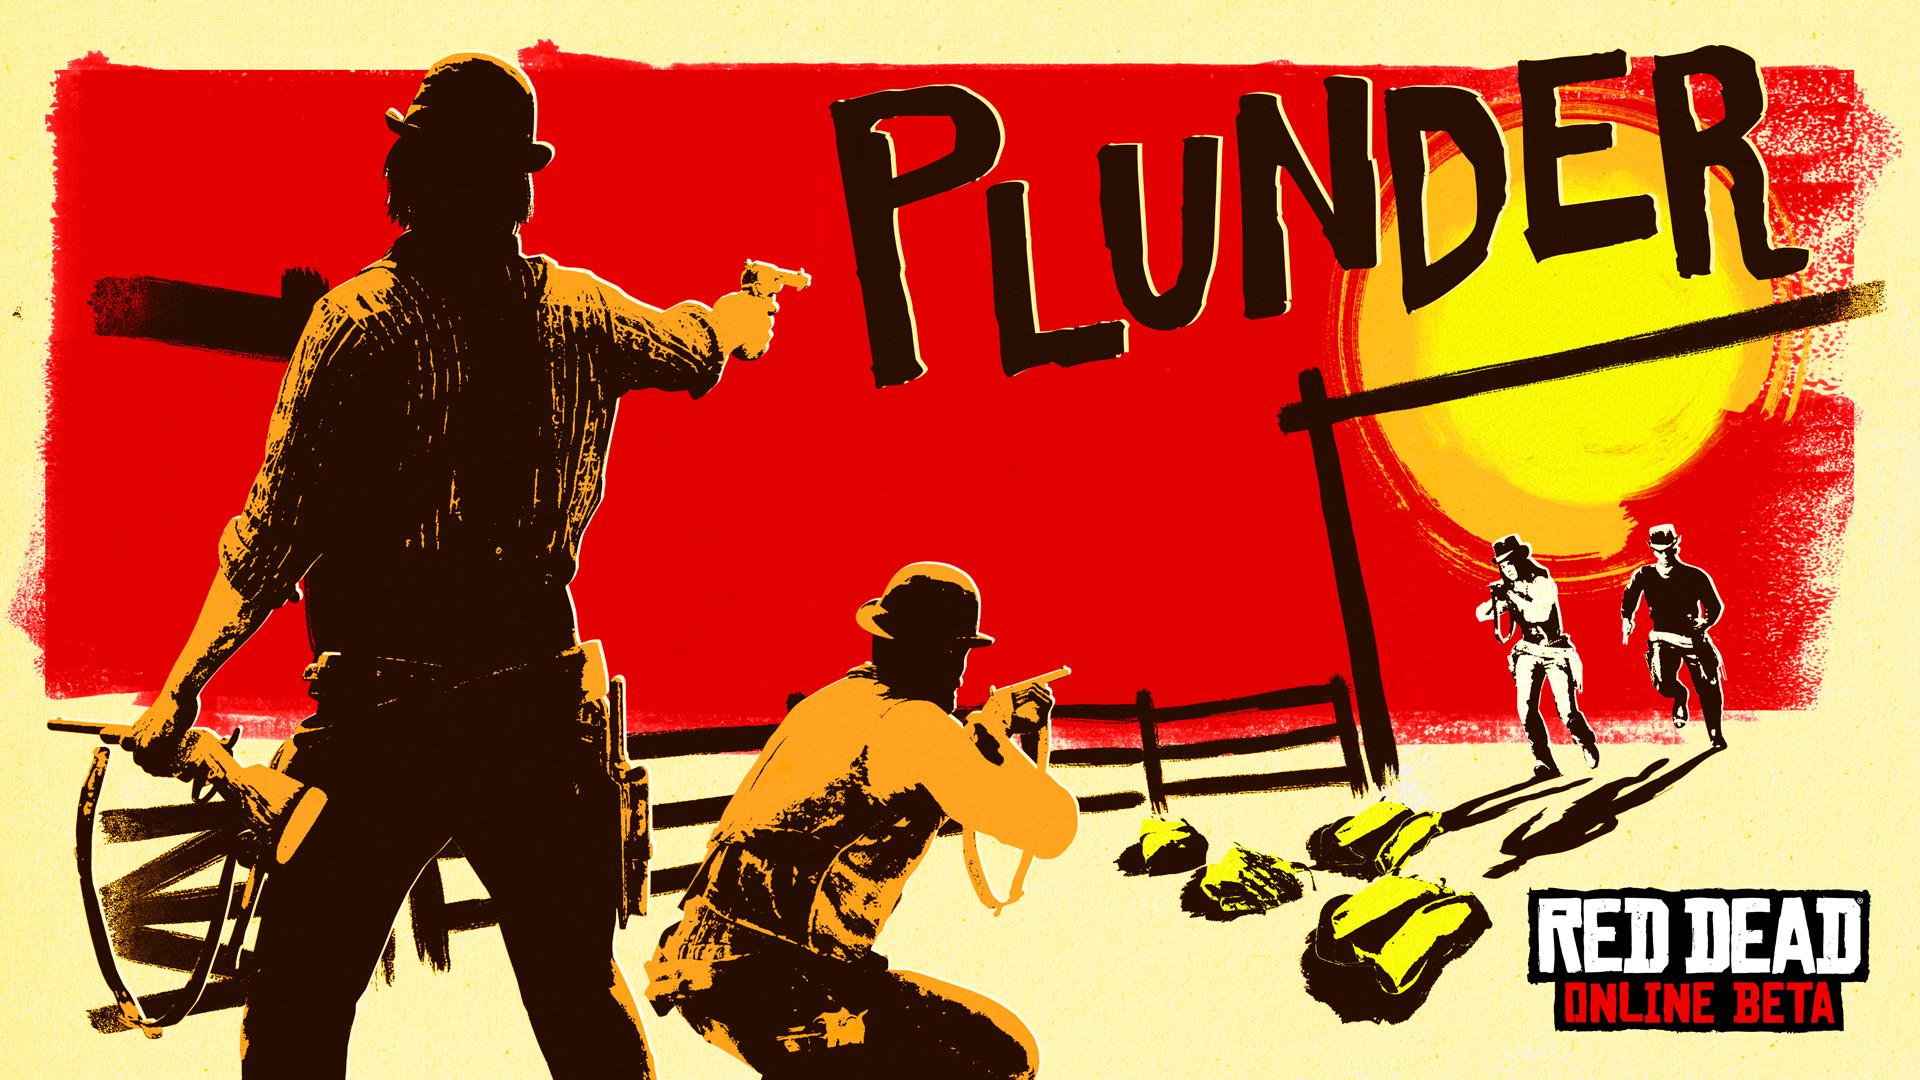 Red Dead Online Beta - Mode Confrontation Pillage